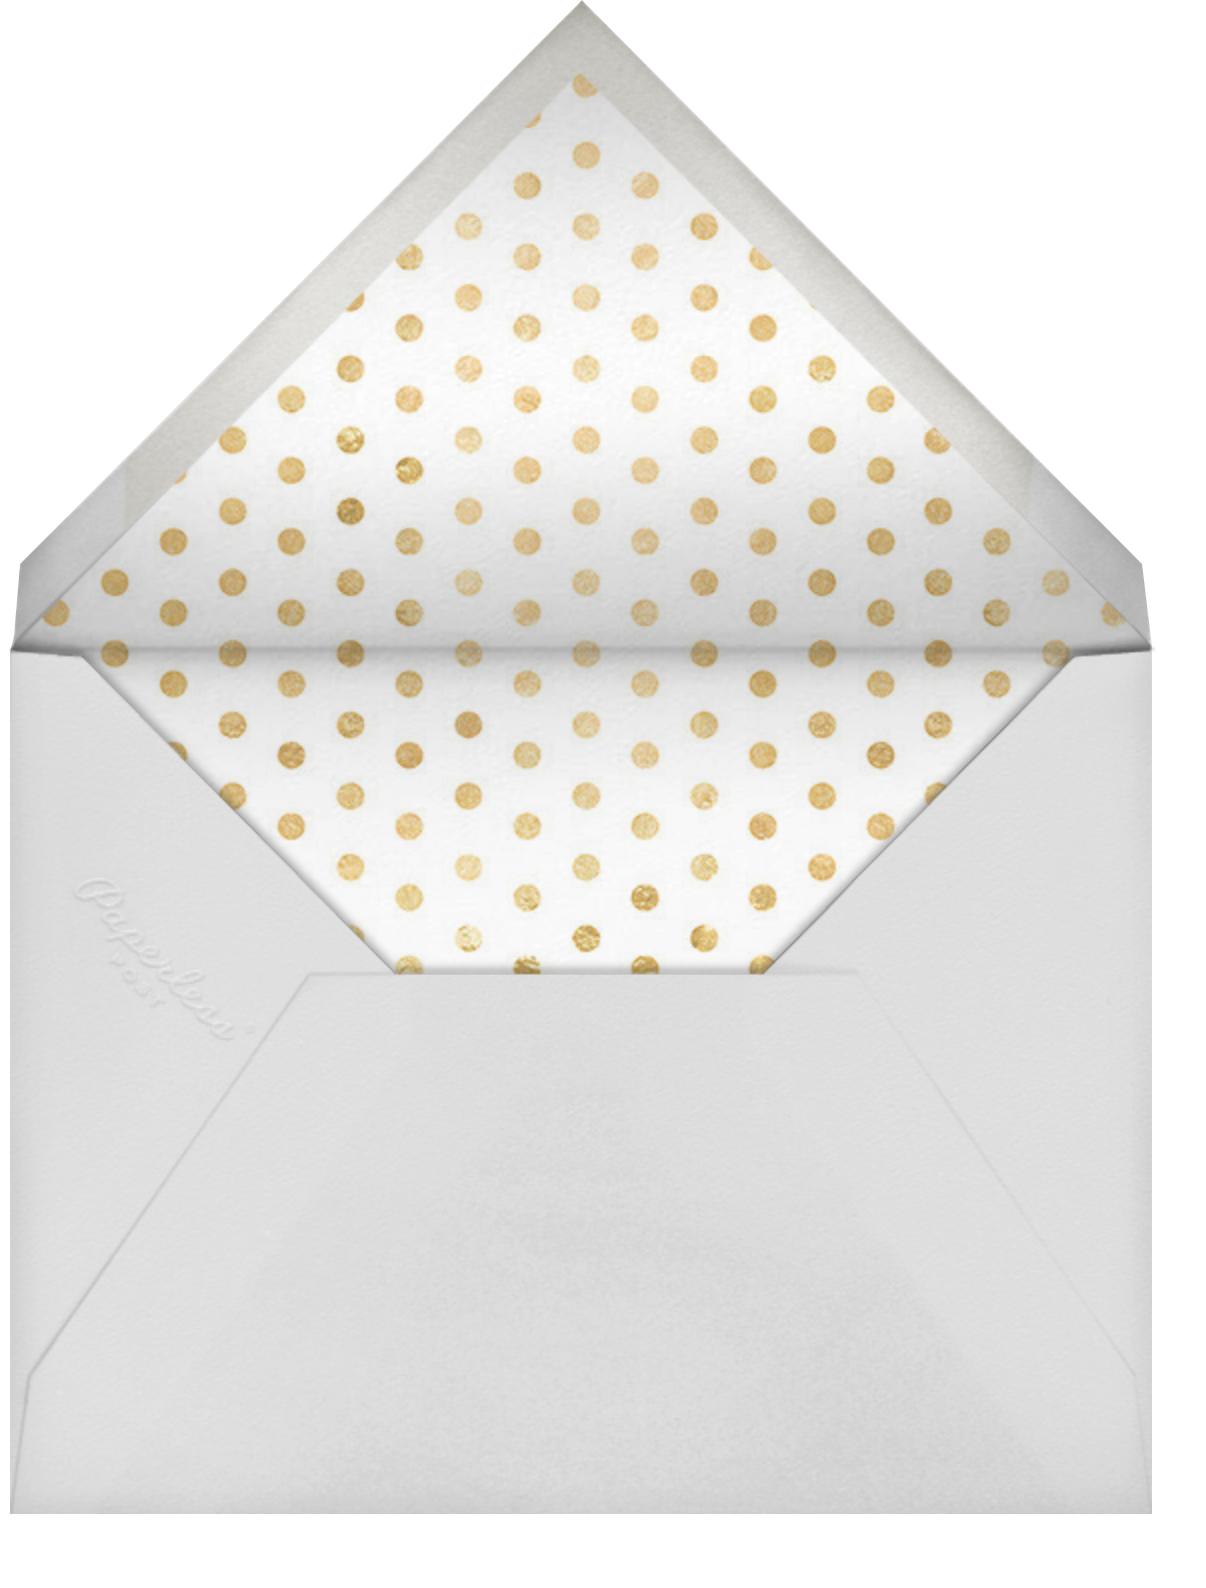 Champagne Tower - Tan - Rifle Paper Co. - Milestone  - envelope back